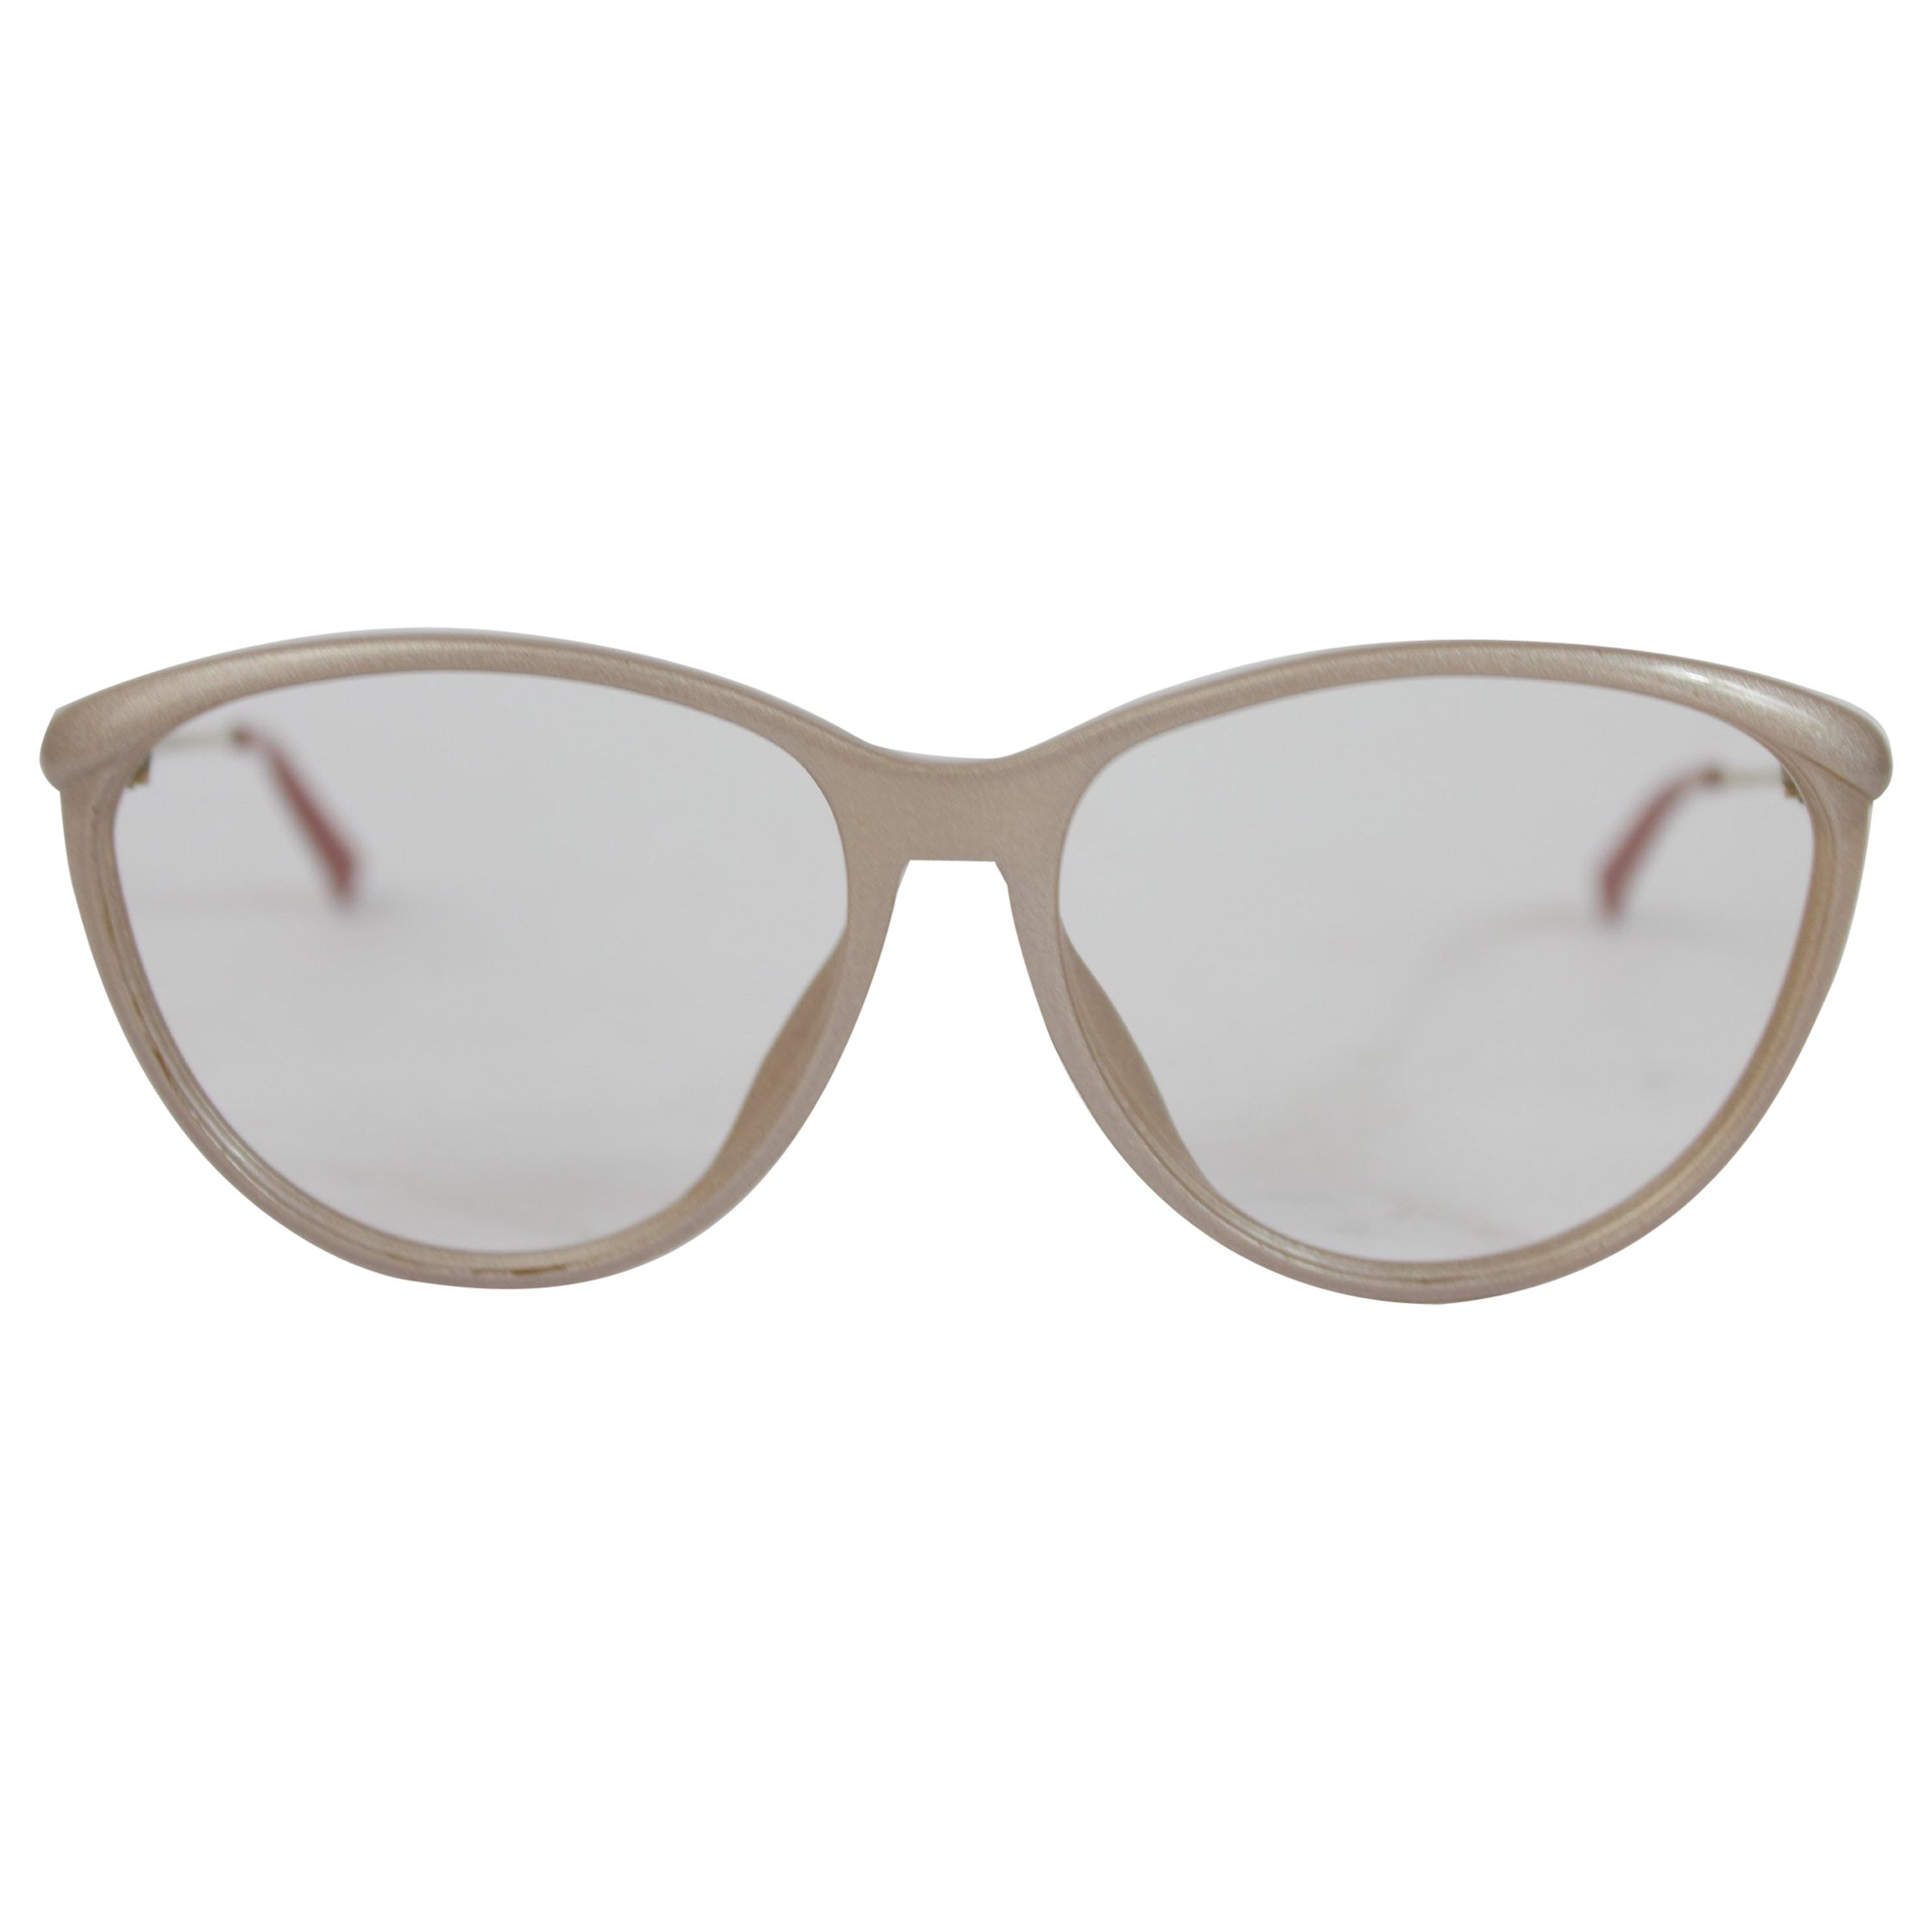 a87d9a9173 1990s Christian Dior Pink Celluloid Frame Eyeglasses 2340 at 1stdibs